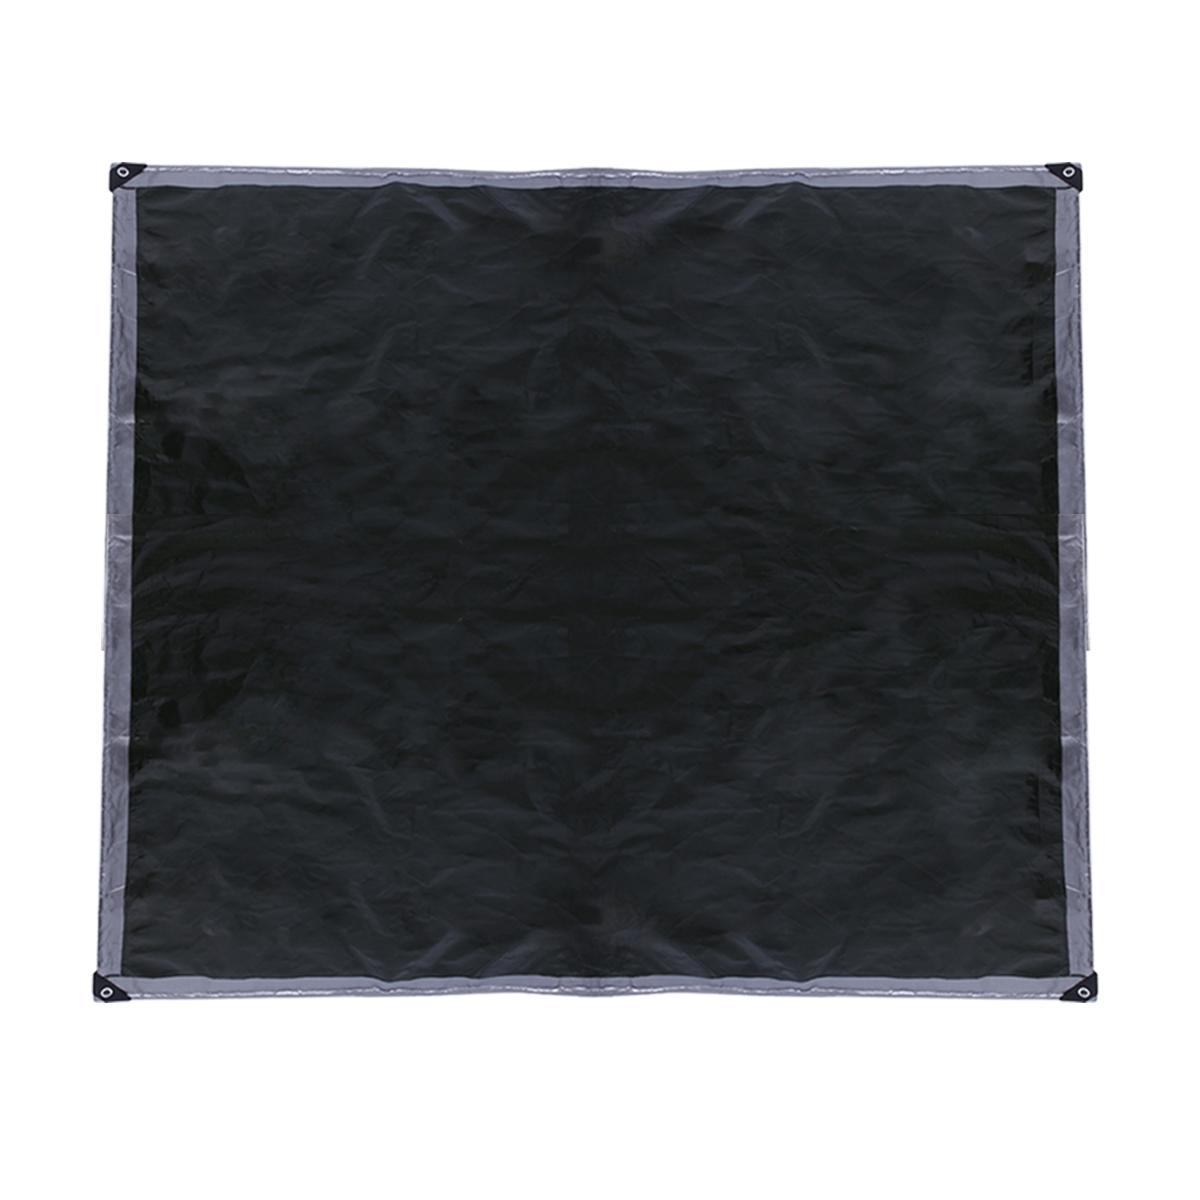 Heavy Duty Poly Tarps PE Tarpaulin Camping Cover UV Water Rot Proof Tent Sunshade